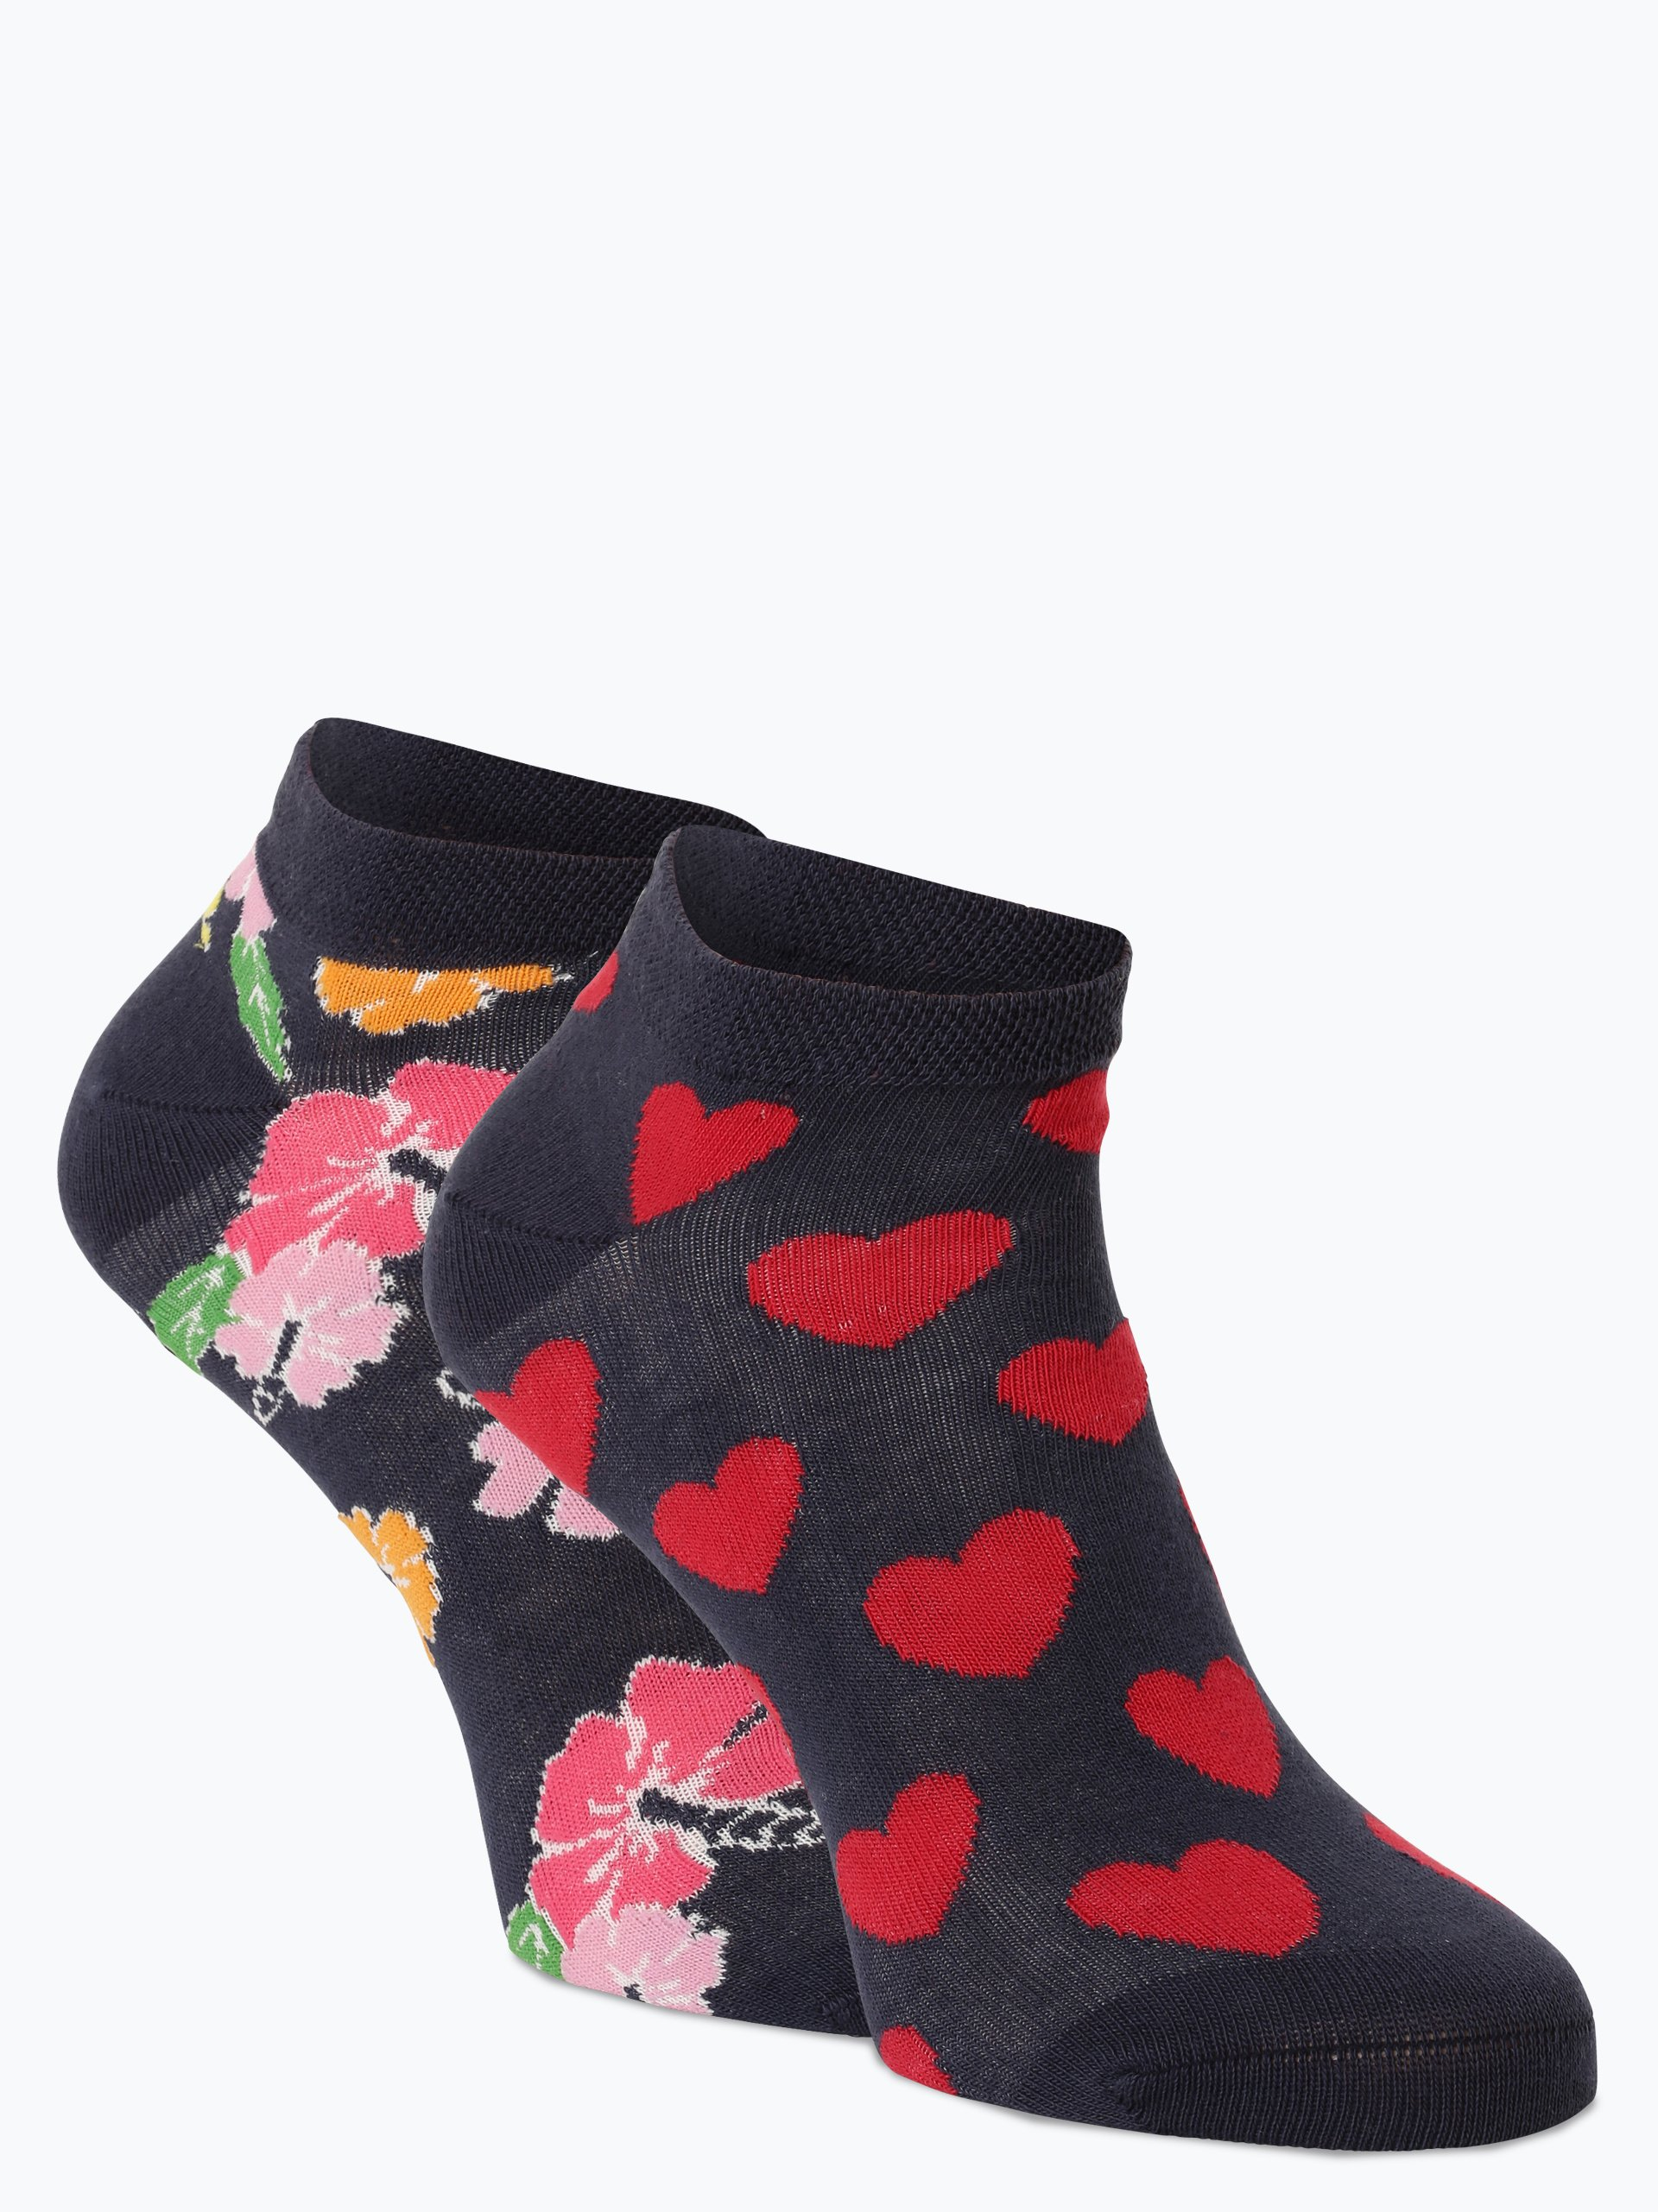 Unabux Feinstrick-Socken im 2er-Pack